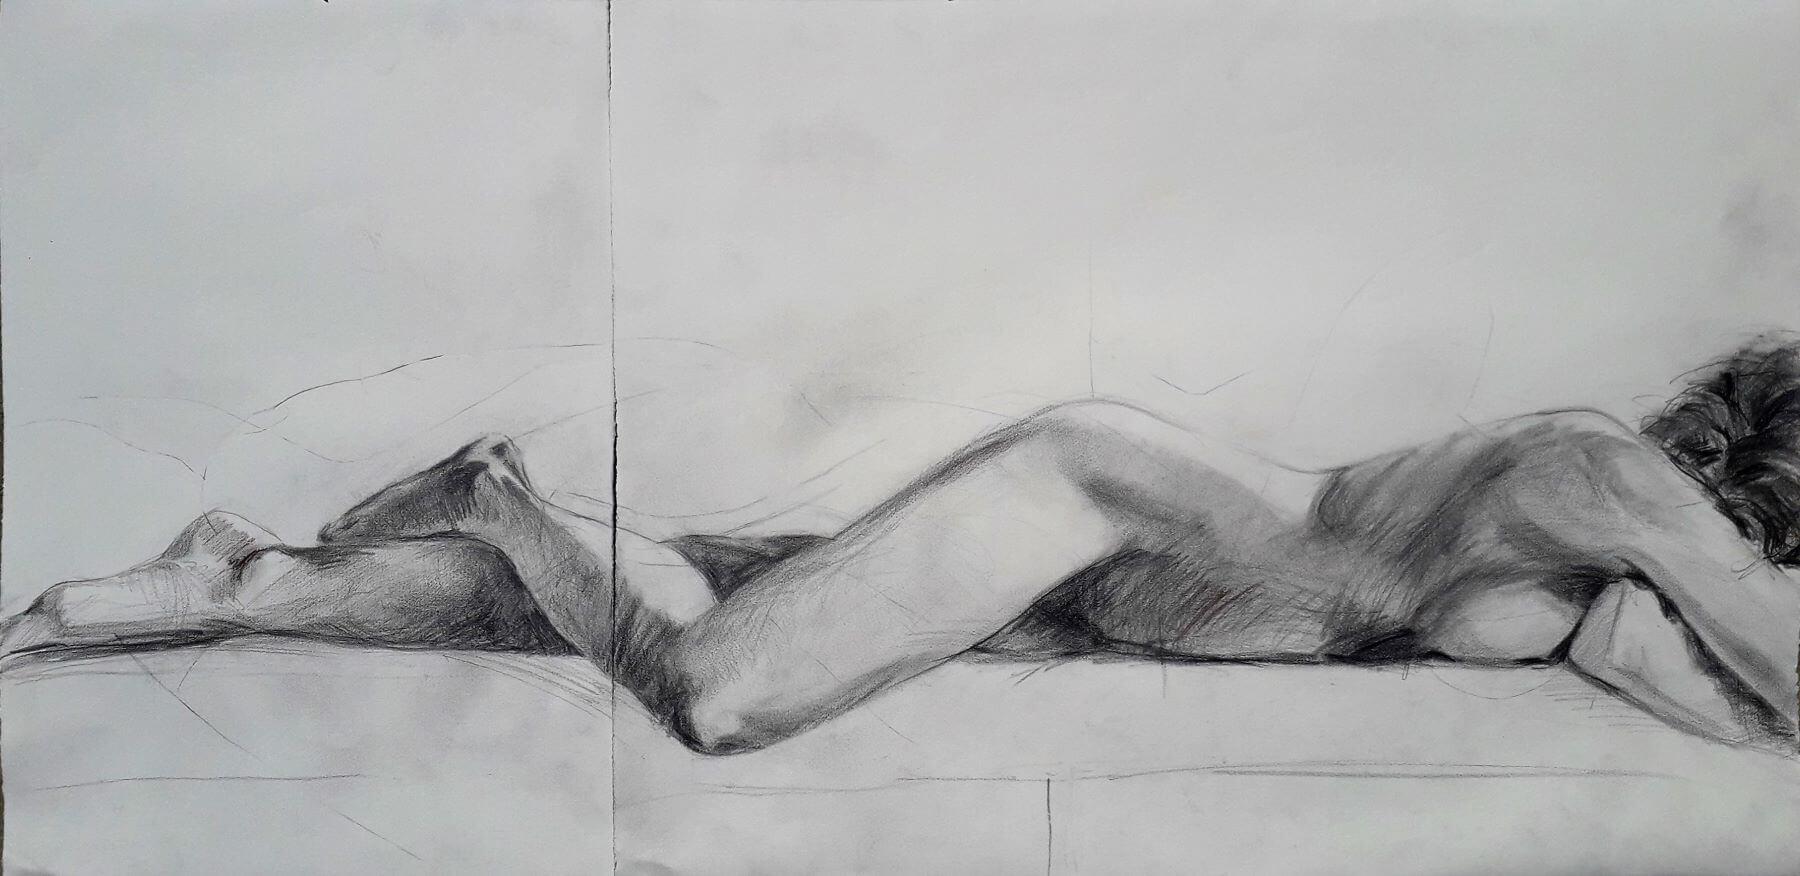 How I See It - drawing, graphite n paper by artist Neva Bergemann